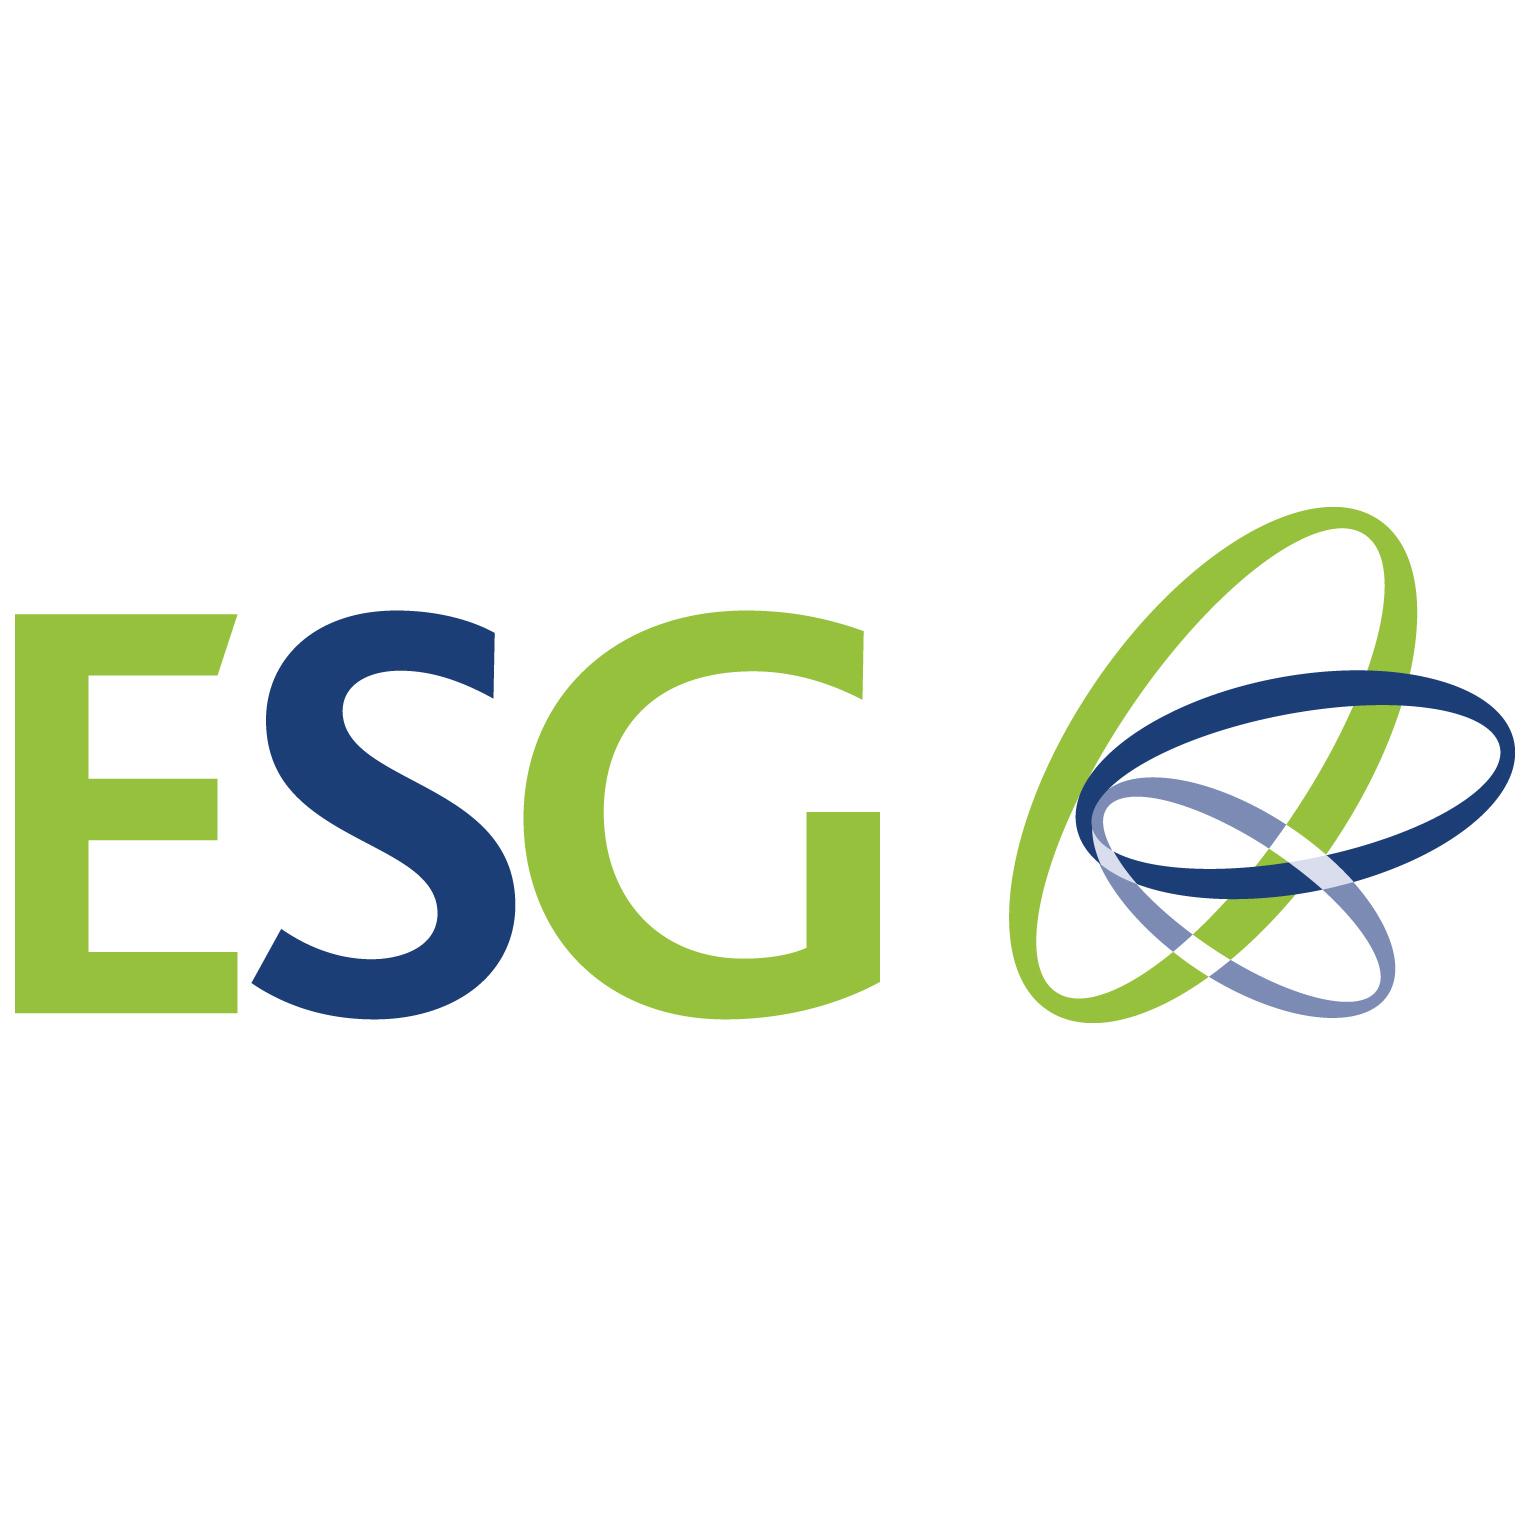 esg_2014_rgb_logo_large-1.jpg